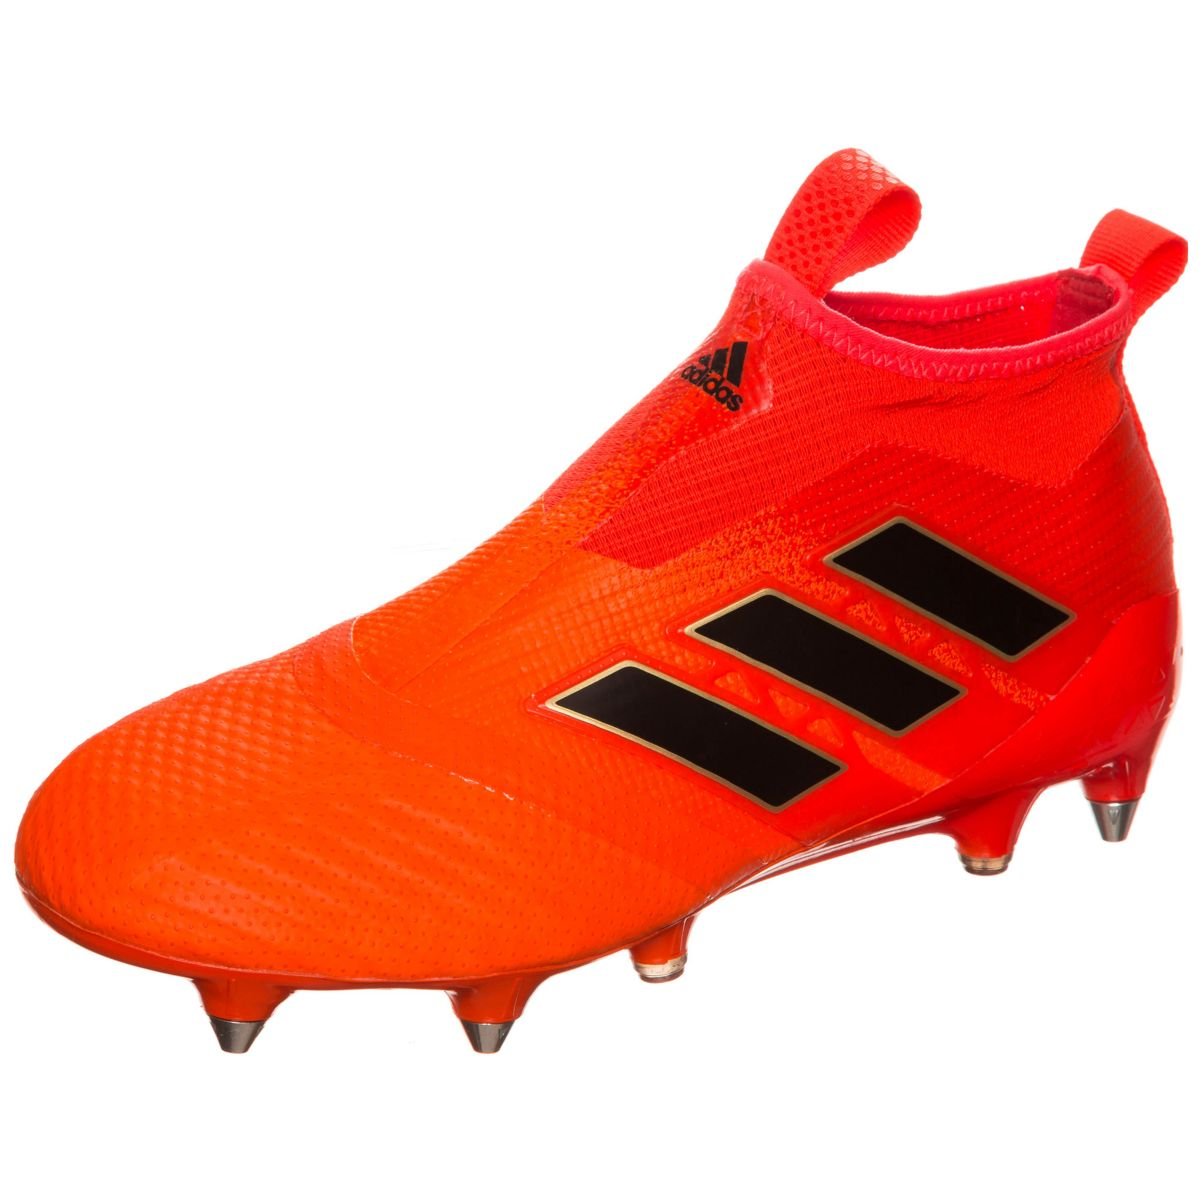 297bb699ced2fc adidas Performance Fußballschuh »Ace 17+ Purecontrol«